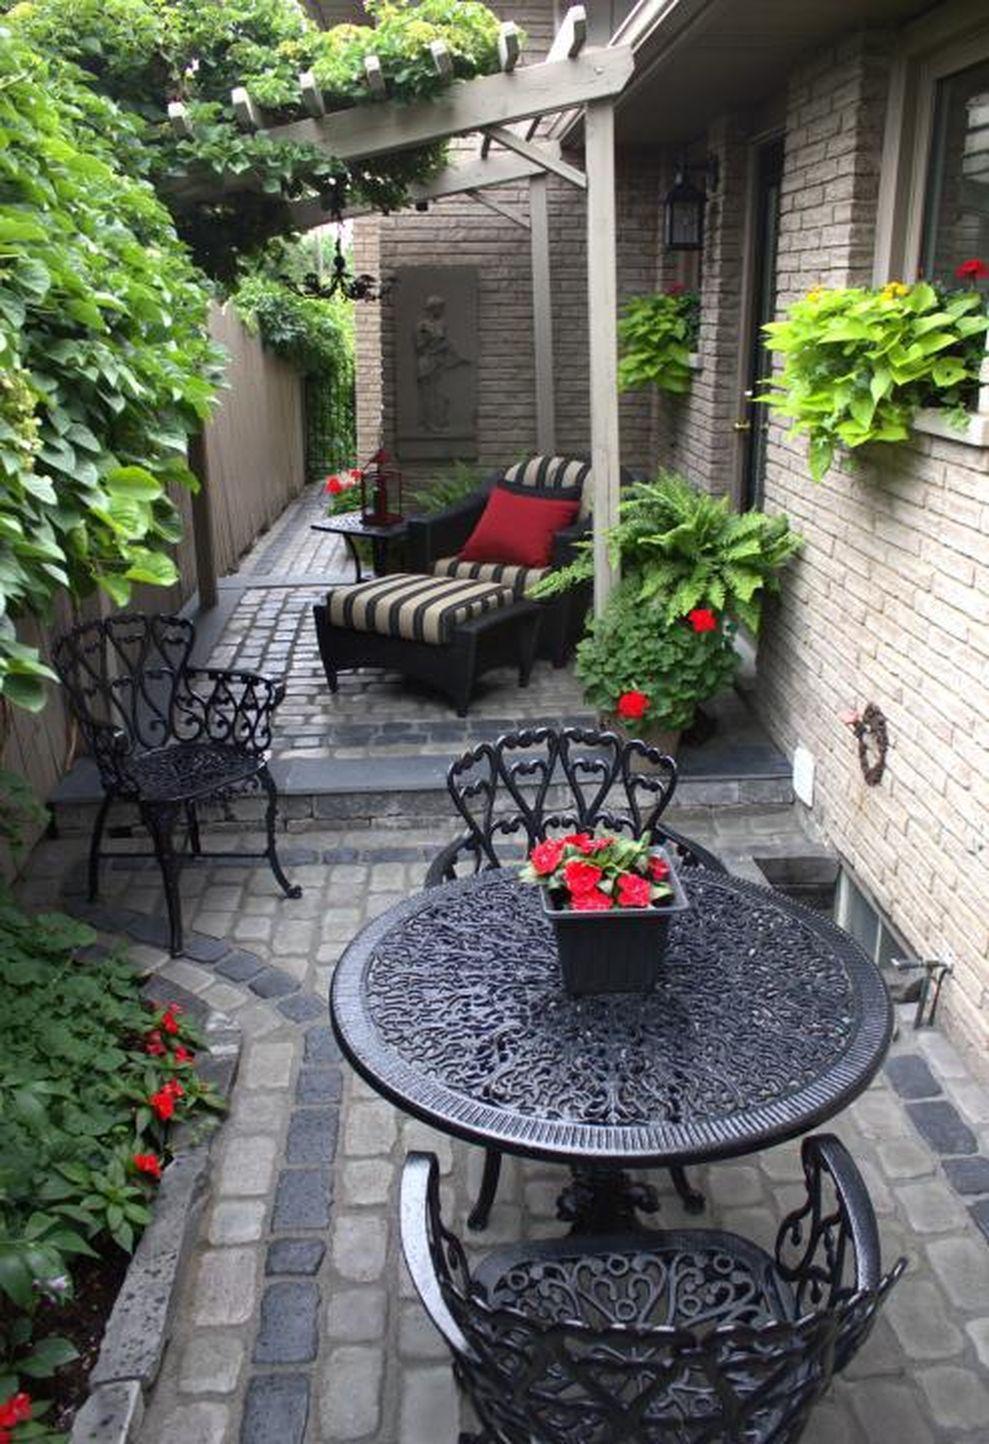 80 Cute Simple Tiny Patio Garden Ideas Http Seragidecor Com 80 Cute Simple Tiny Patio Side Yard Landscaping Small Backyard Landscaping Backyard Landscaping Small backyard patio garden ideas